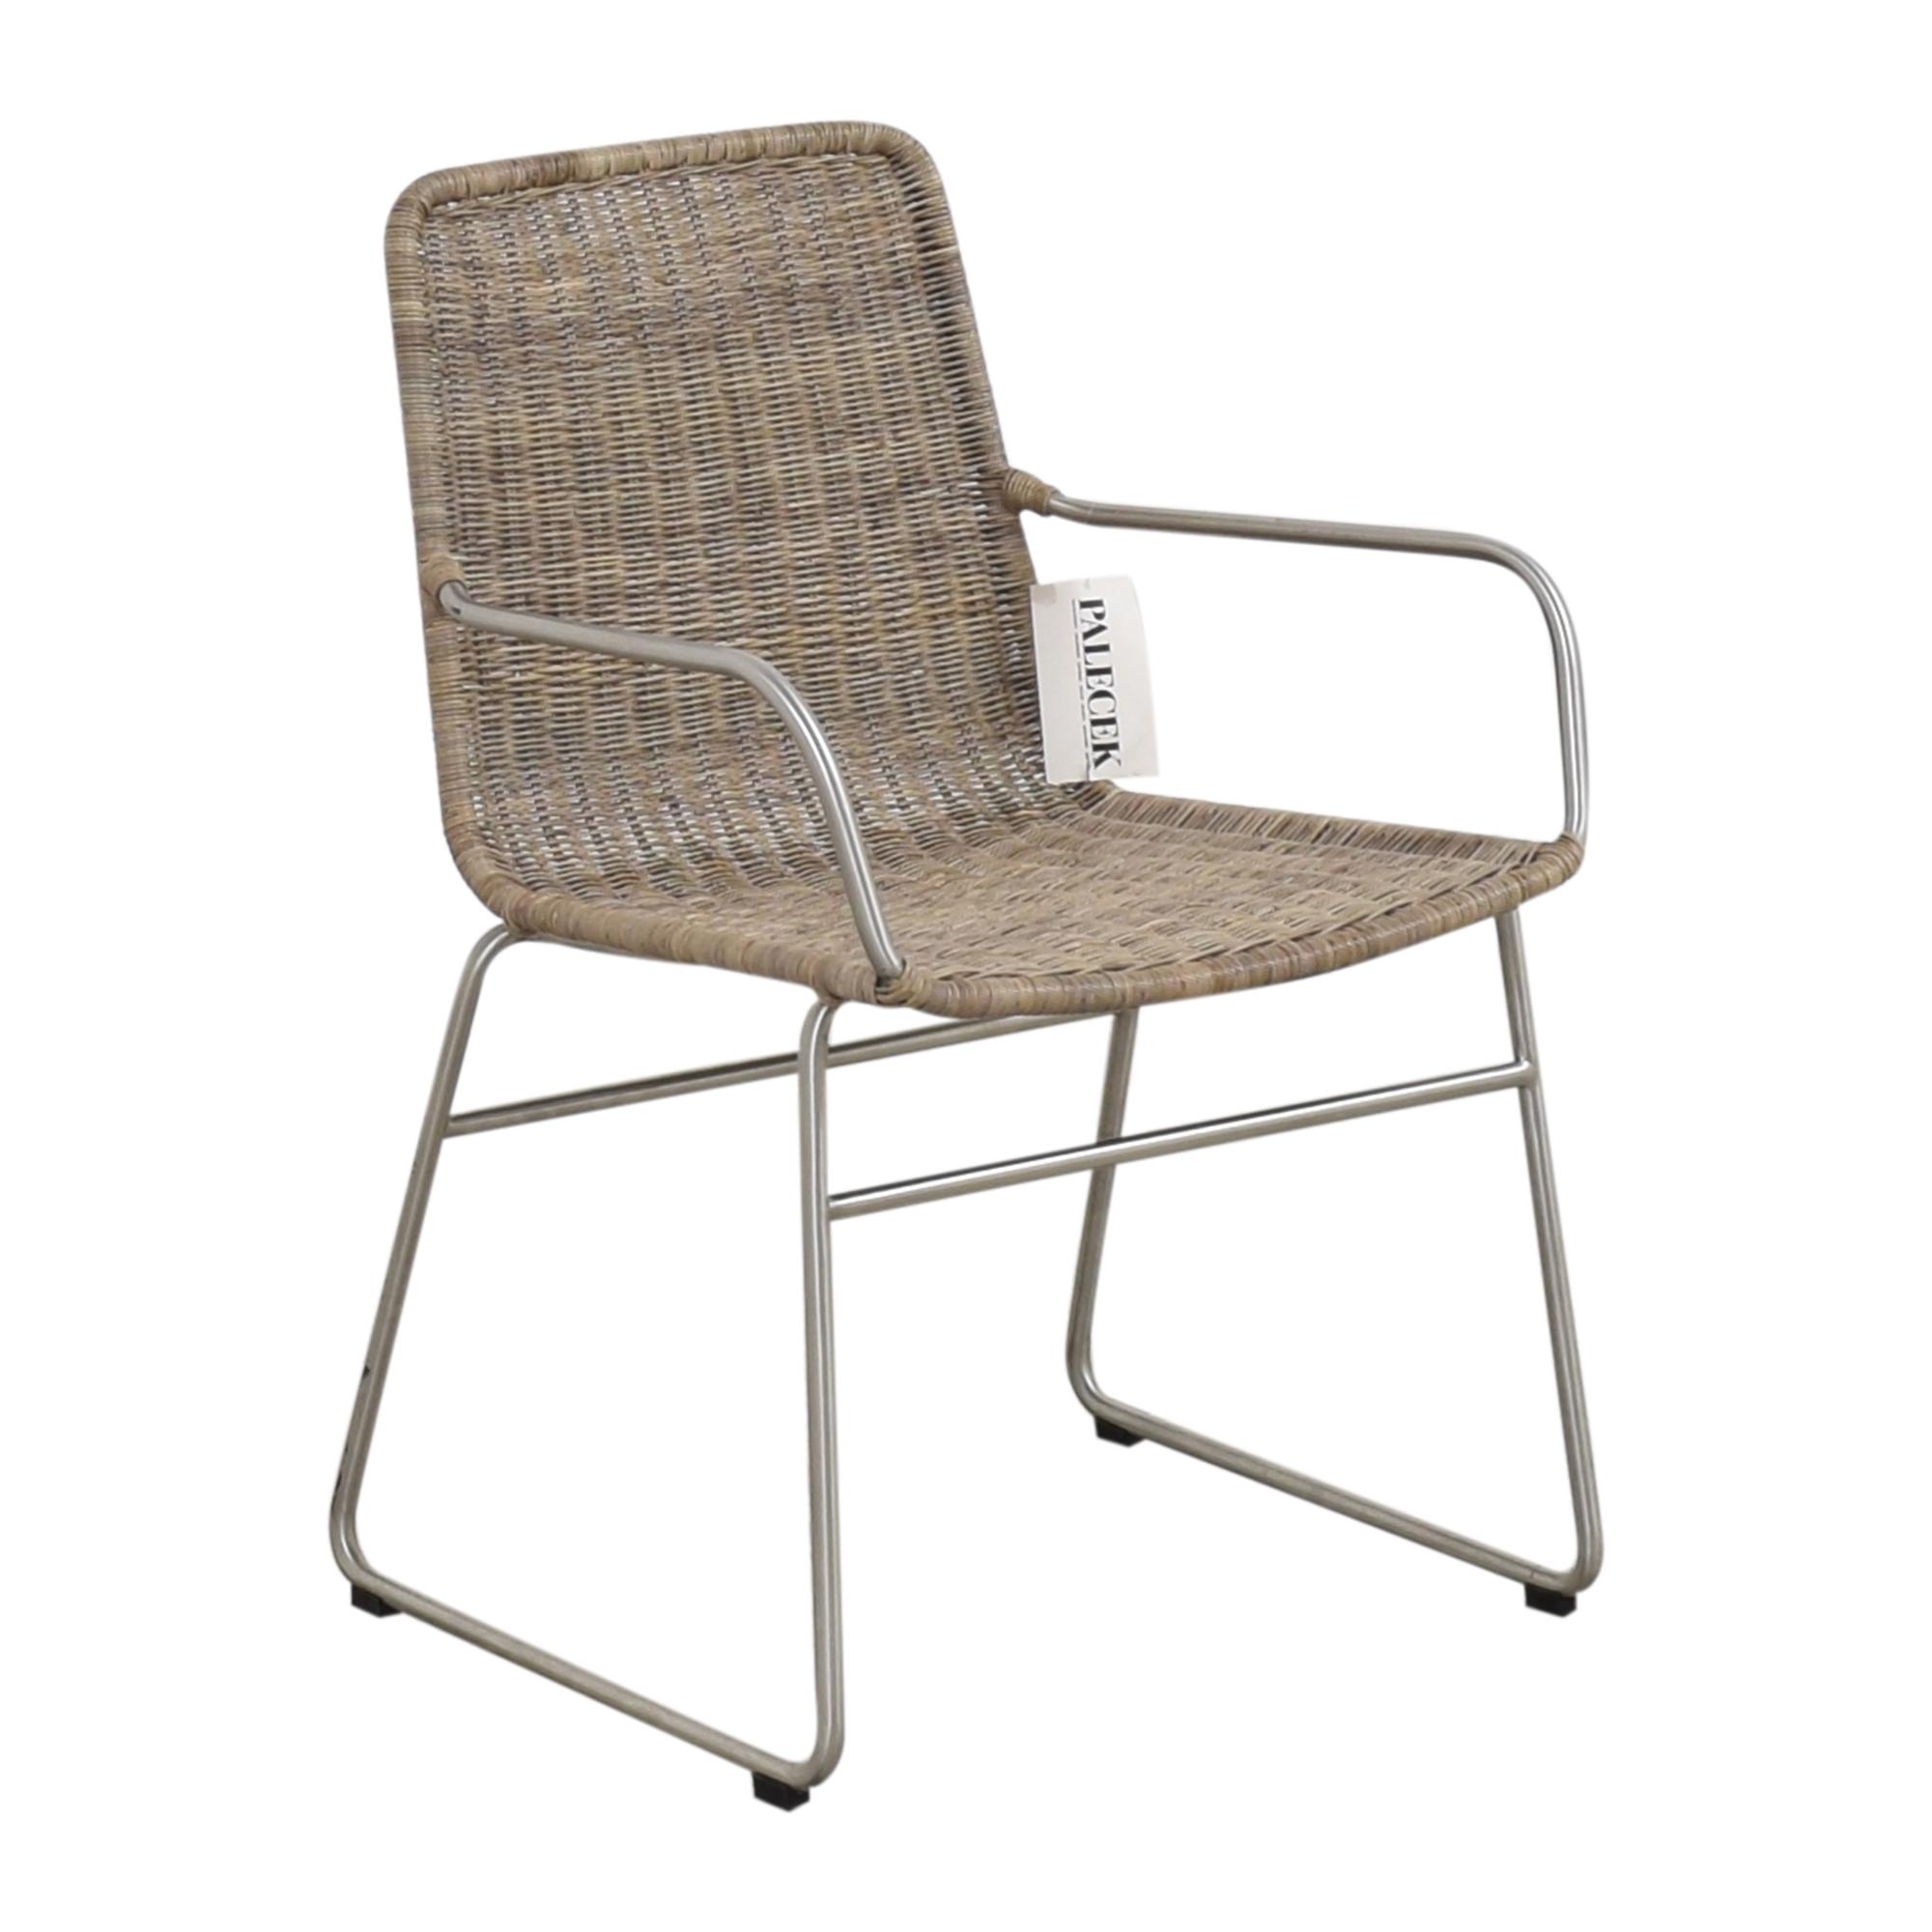 Palecek Palecek Oslo Arm Chair second hand